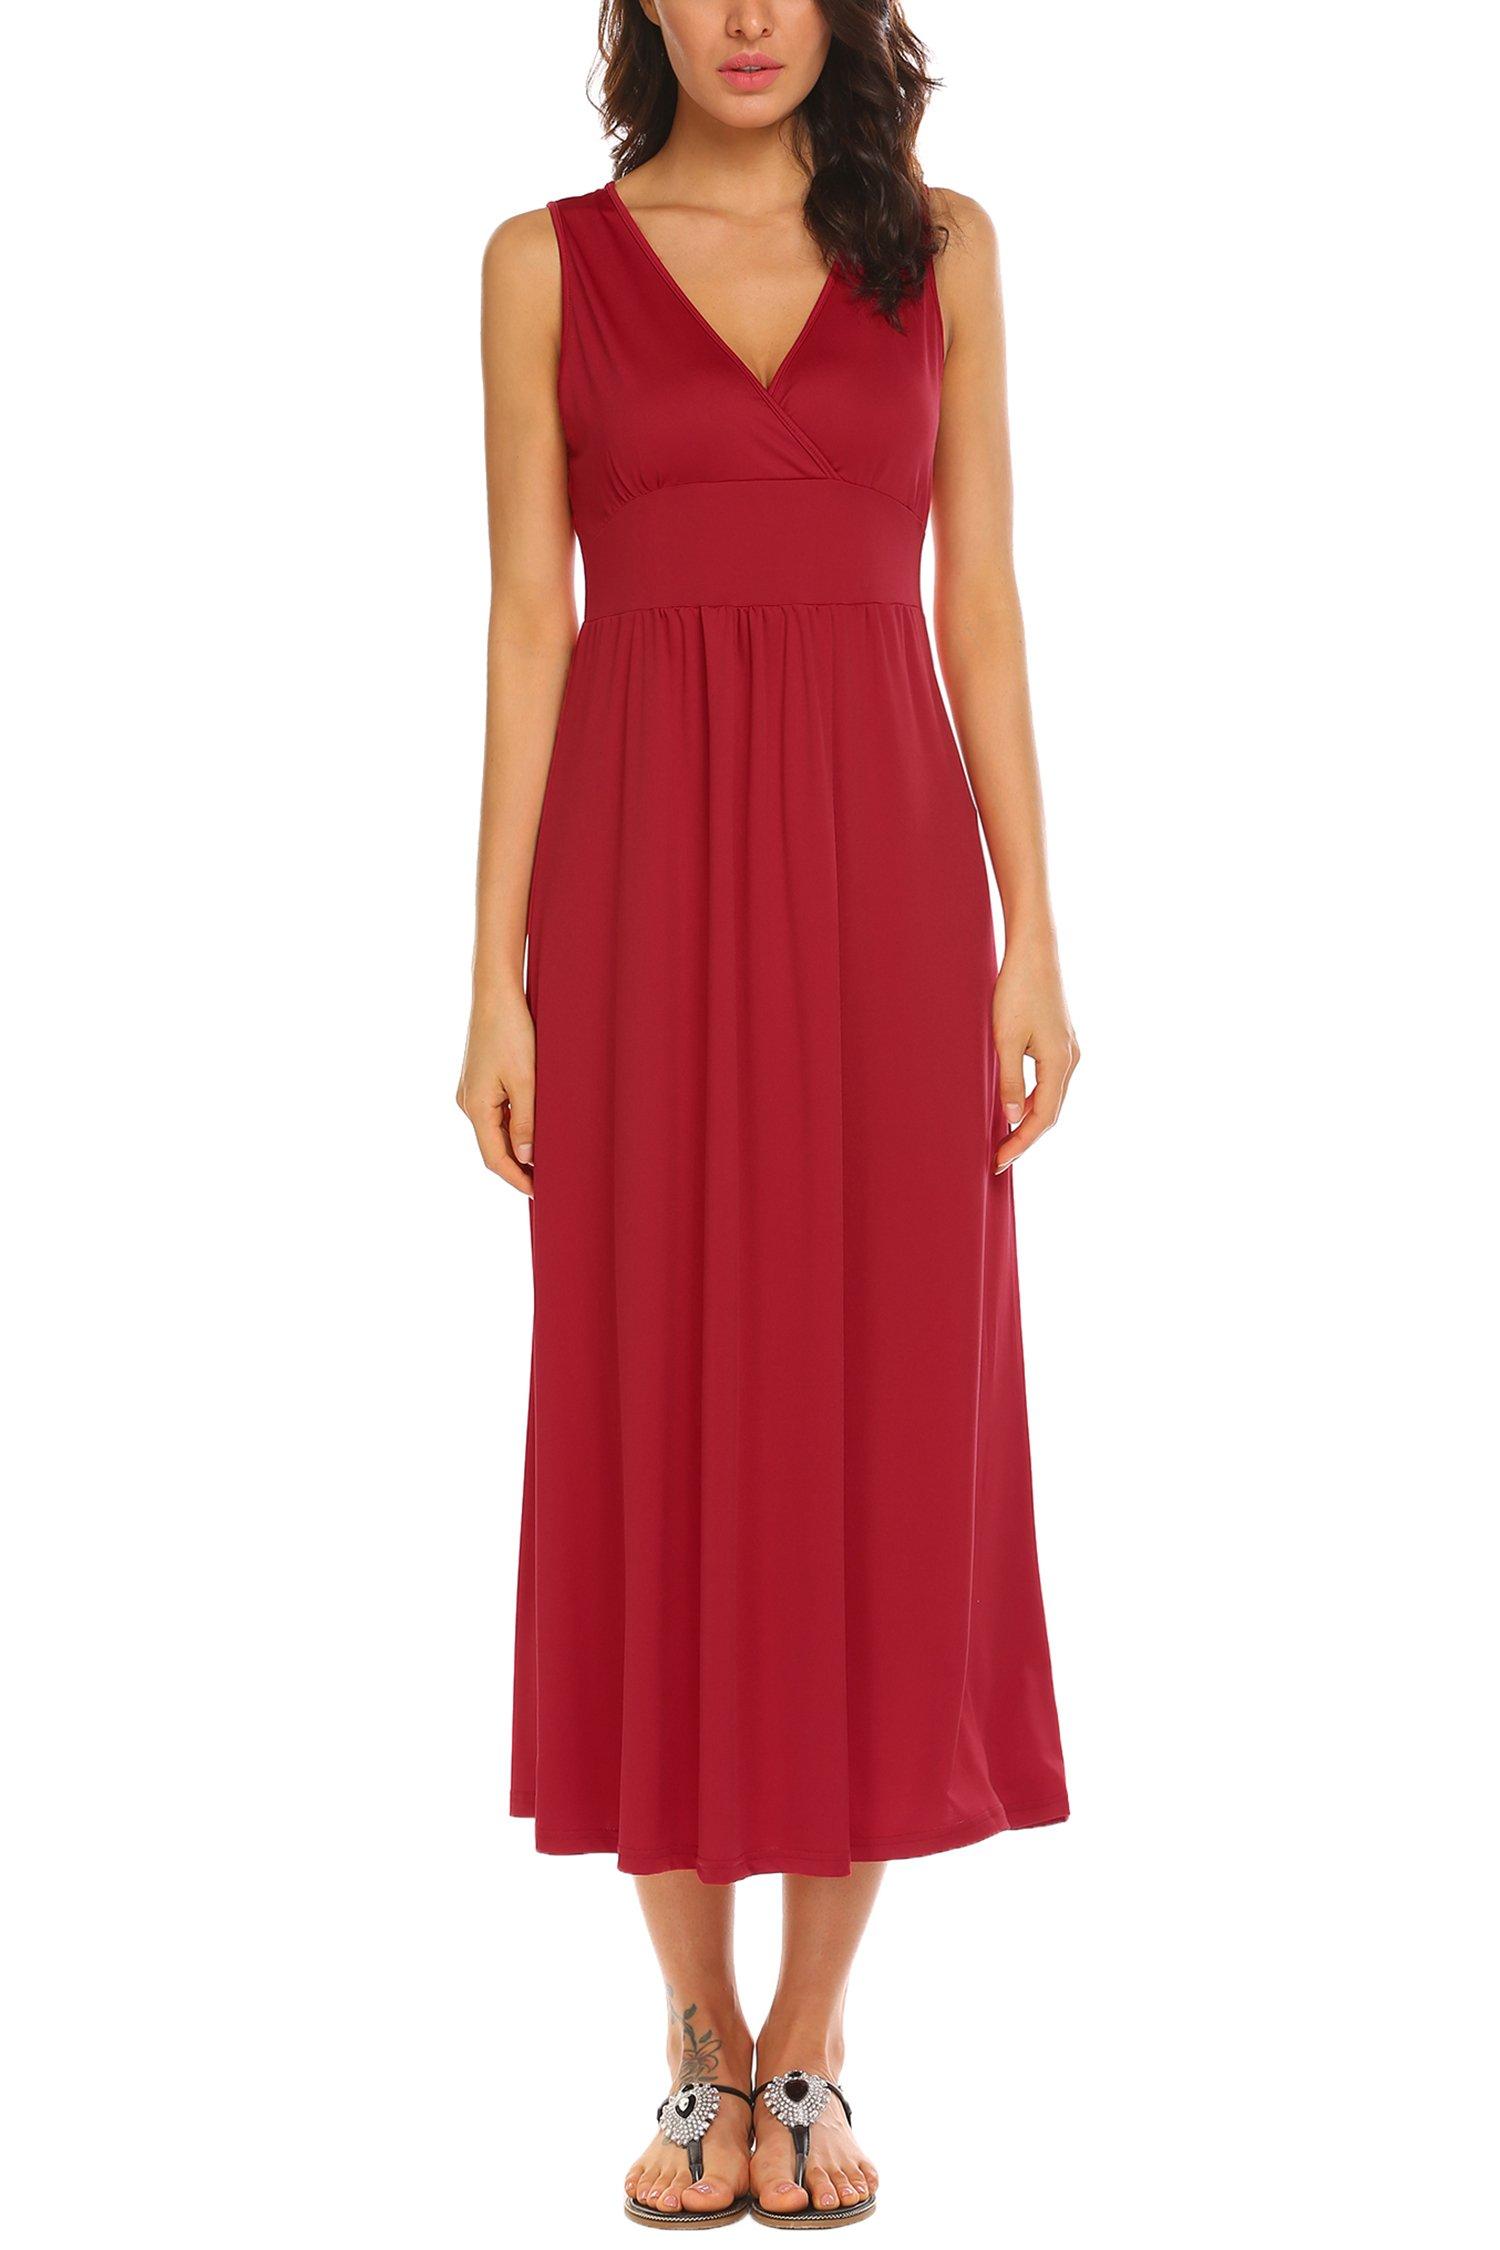 Funpor Women's Sleeveless V Neck Ruched Waist Long Maxi Dress